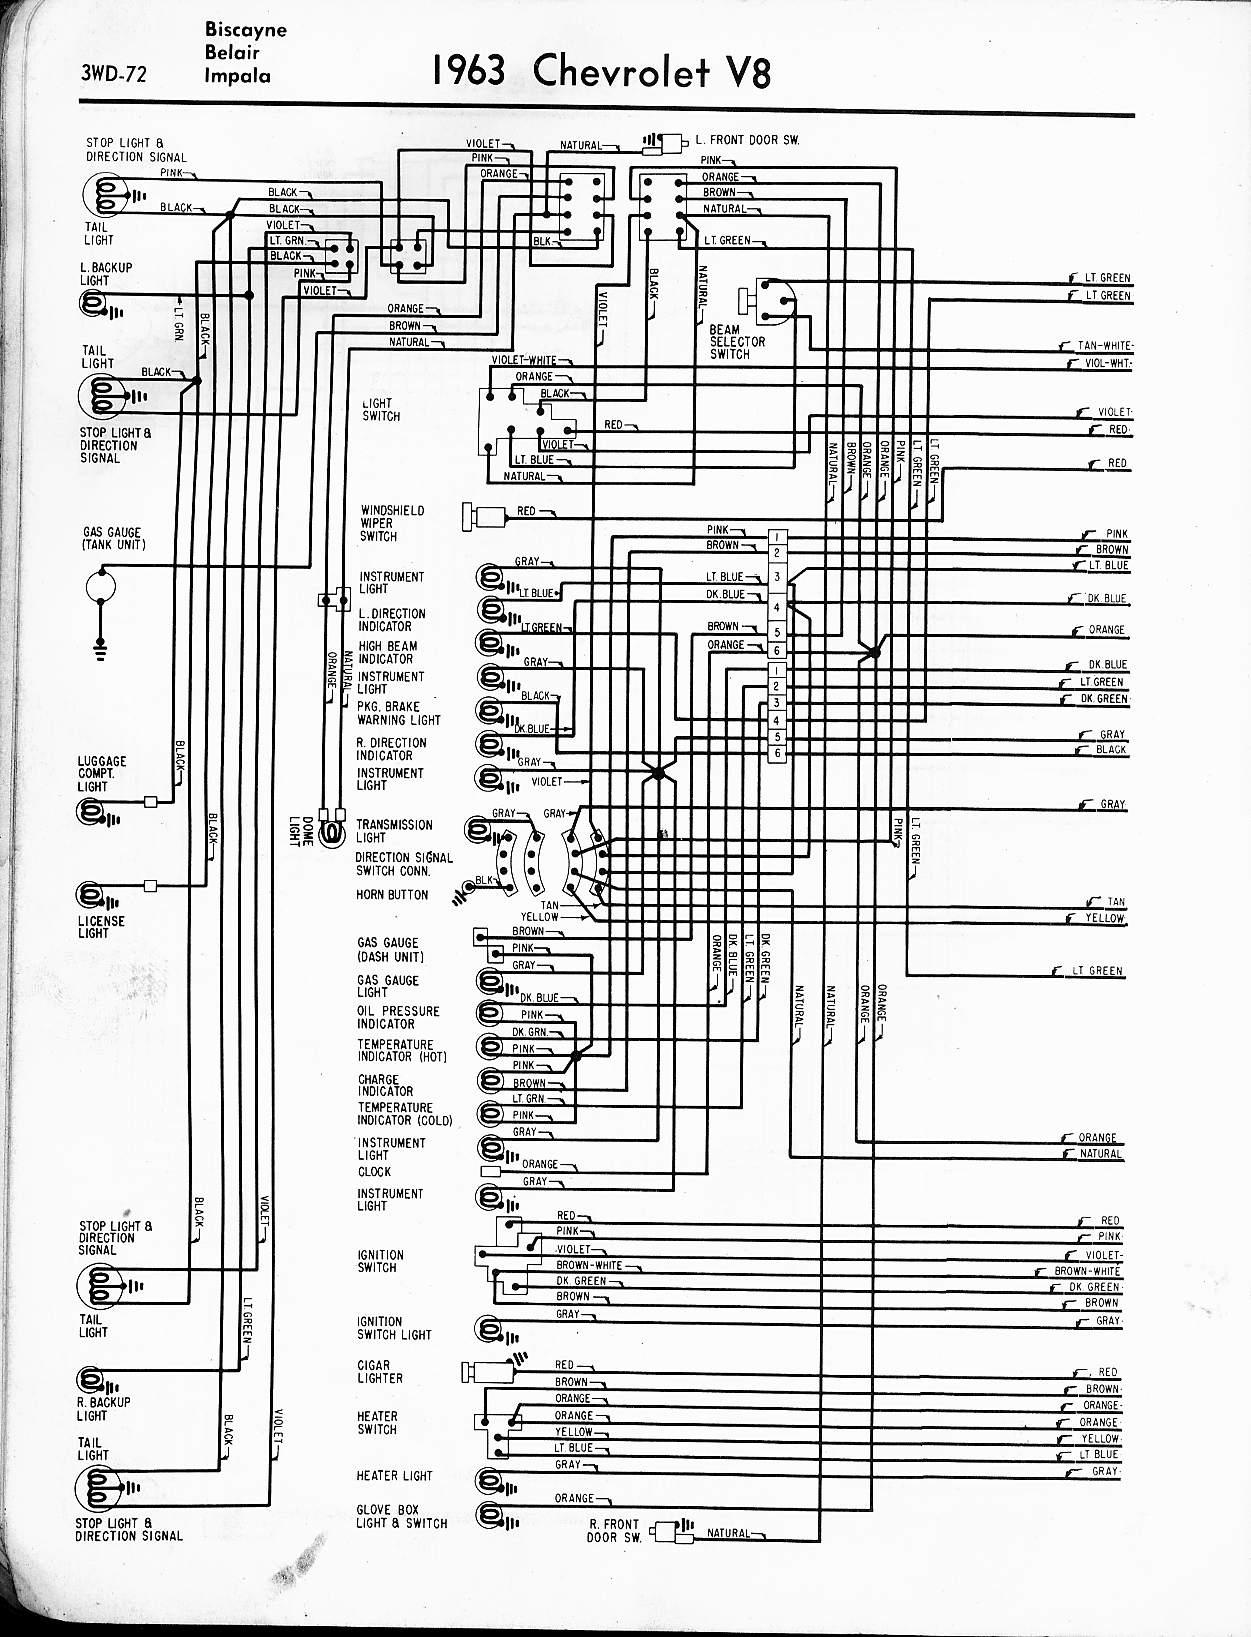 Chevy Impala Wiring Diagram